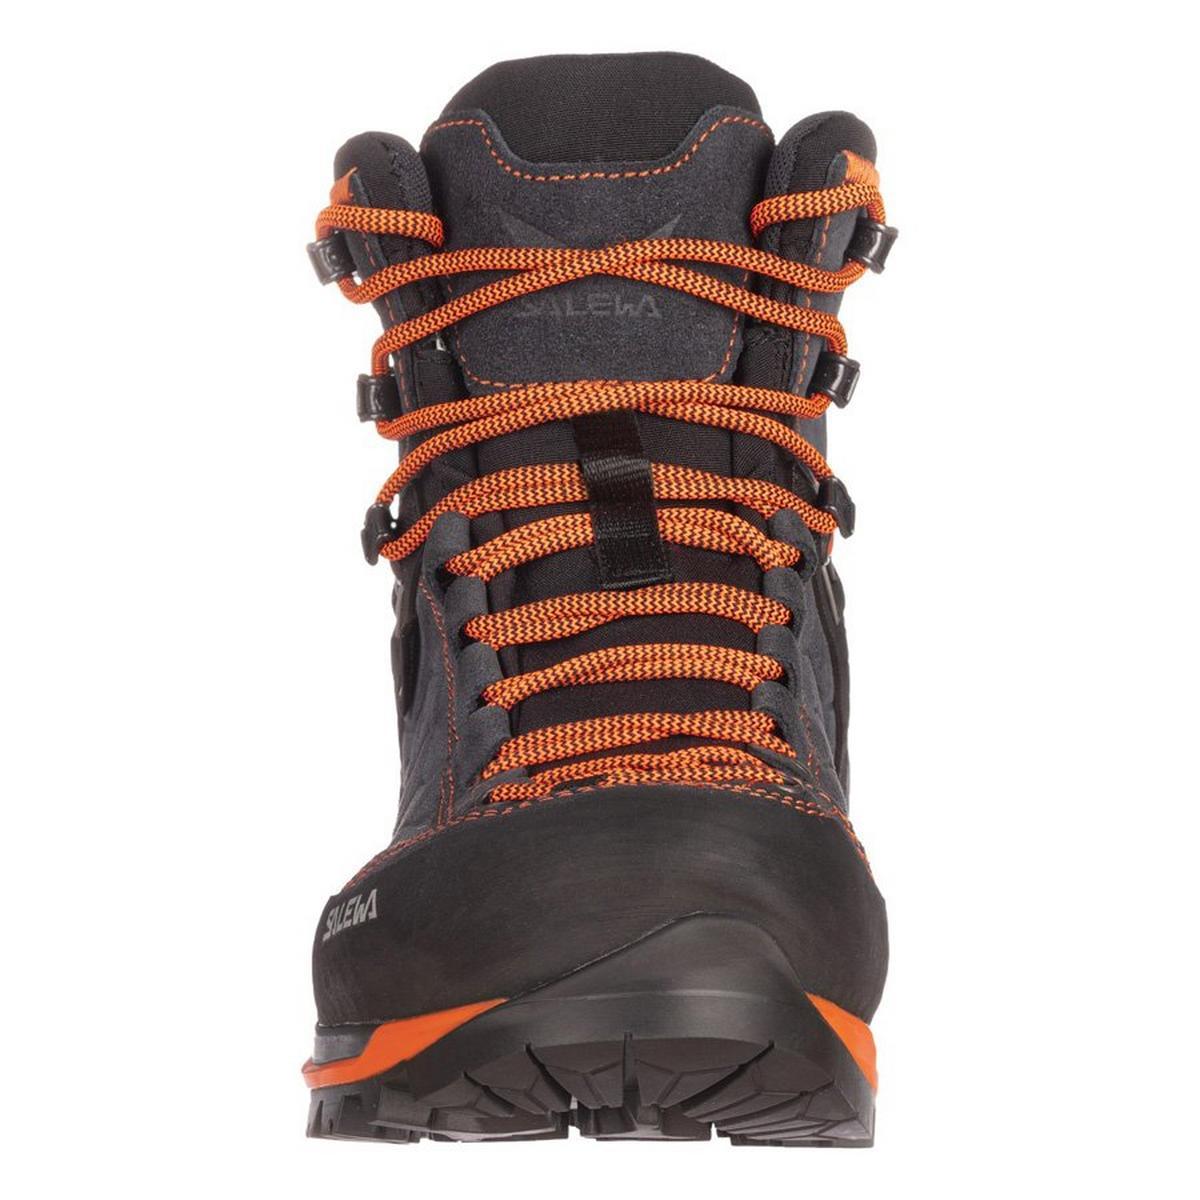 Salewa Men's Mountain Trainer Mid Gore-Tex Walking Boot